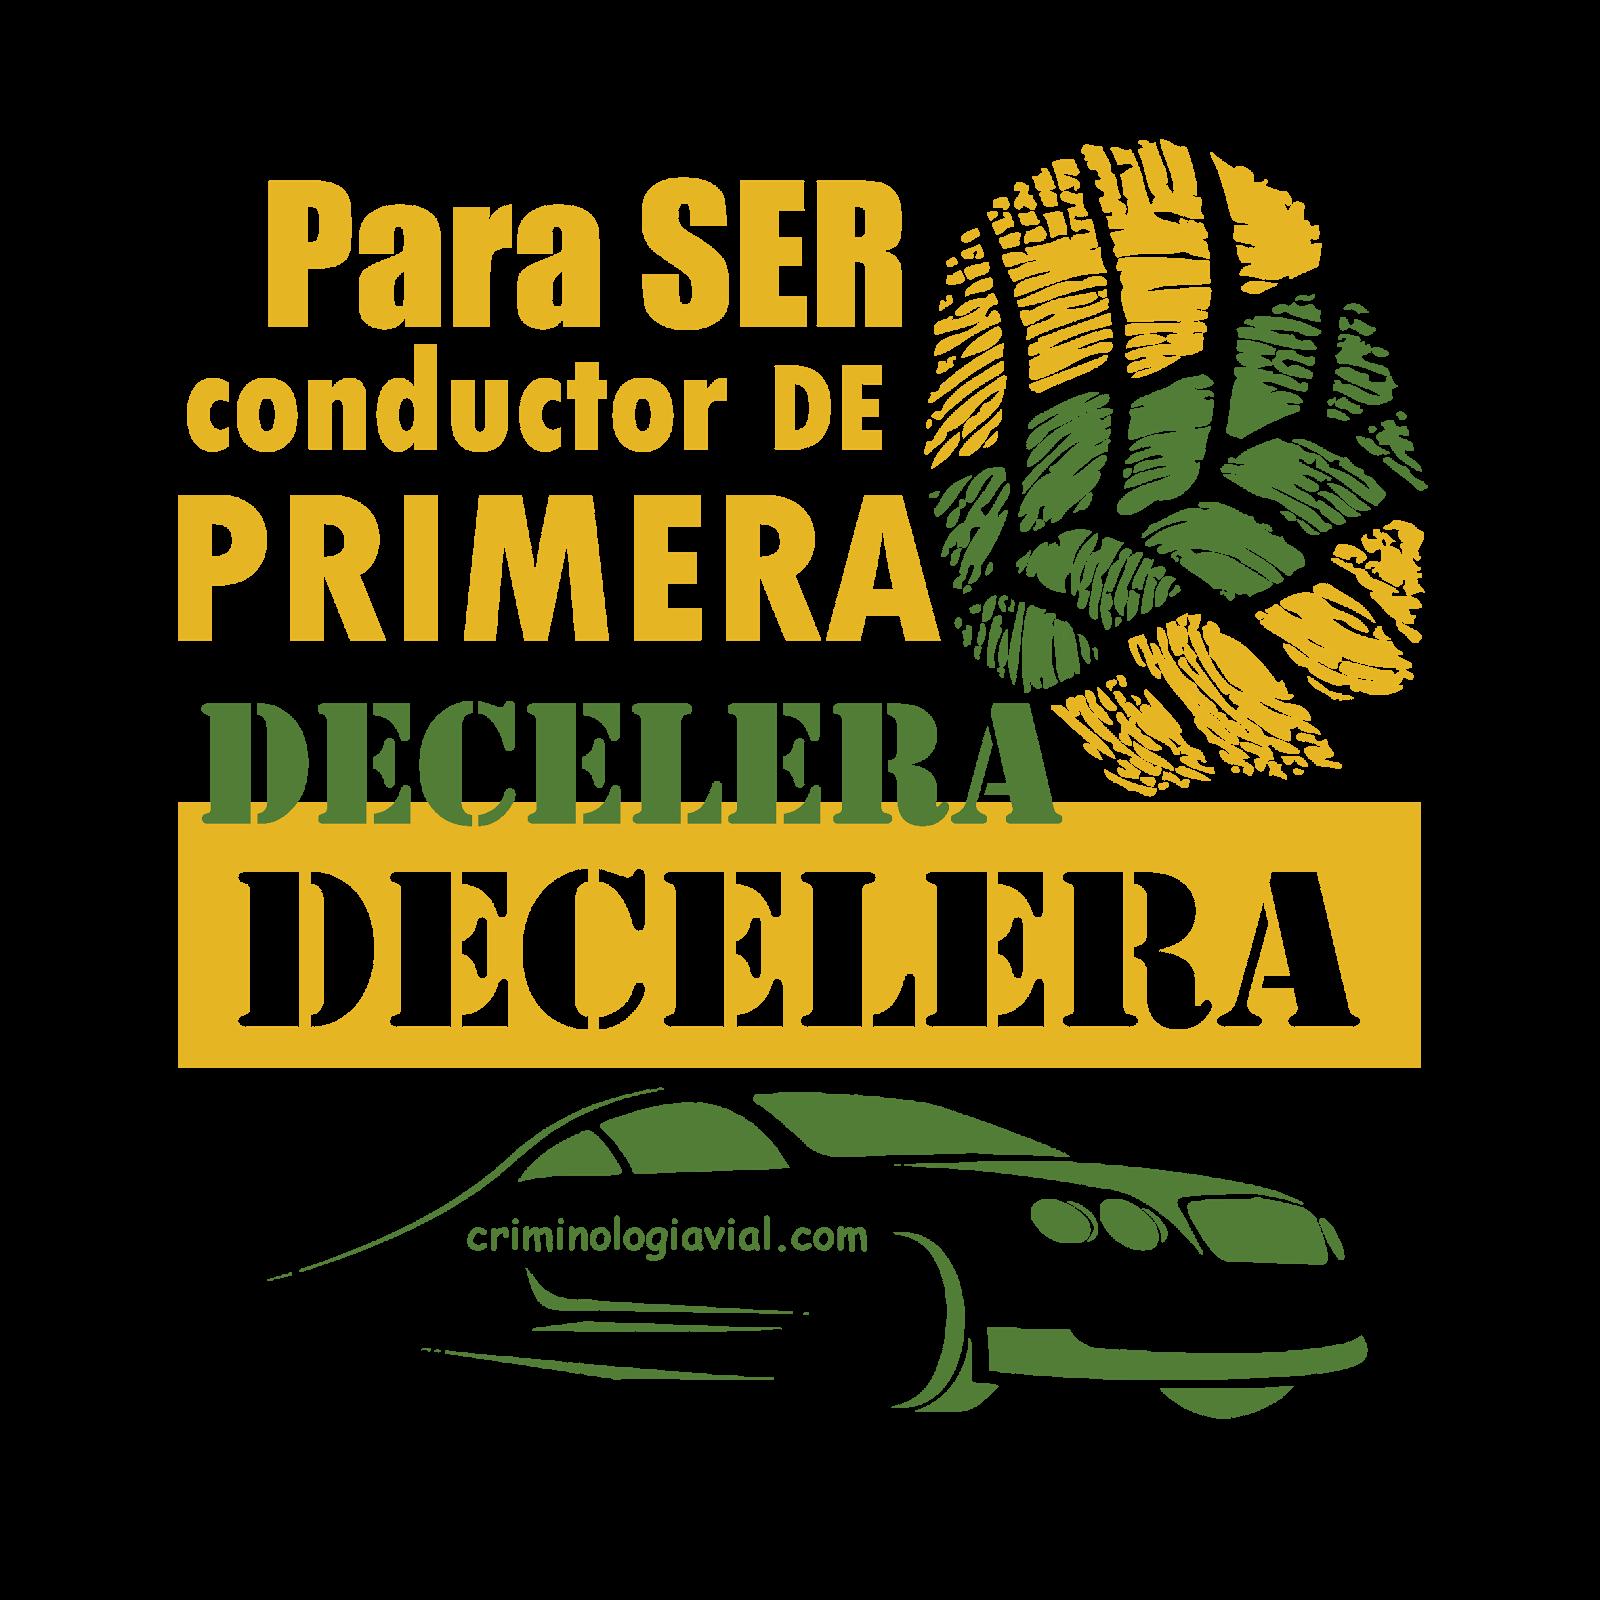 PARA SER CONDUCTOR DE PRIMERA DECELERA, DECELERA